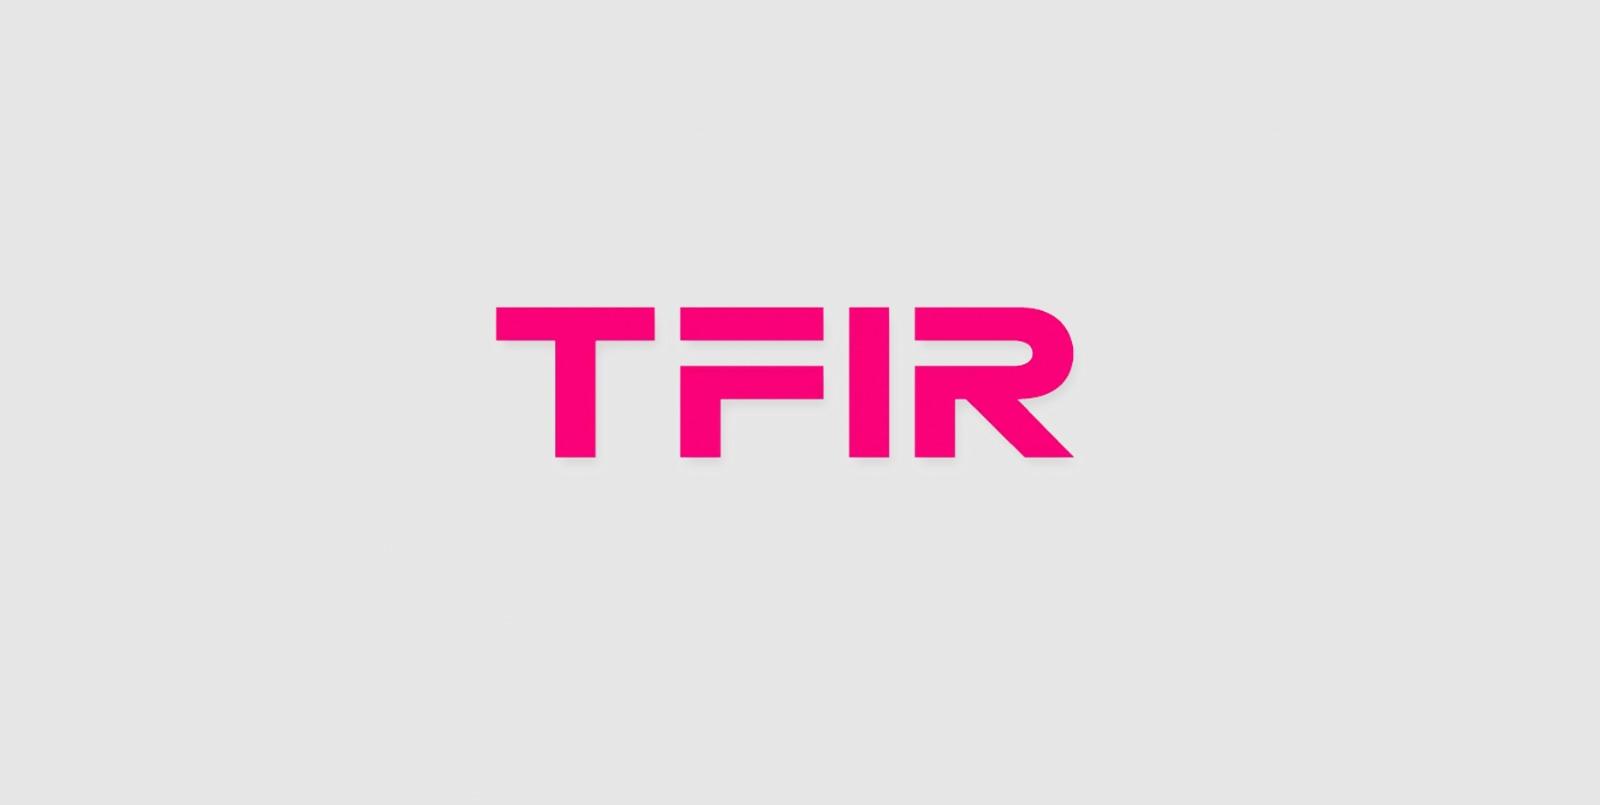 Cloudify TFIR